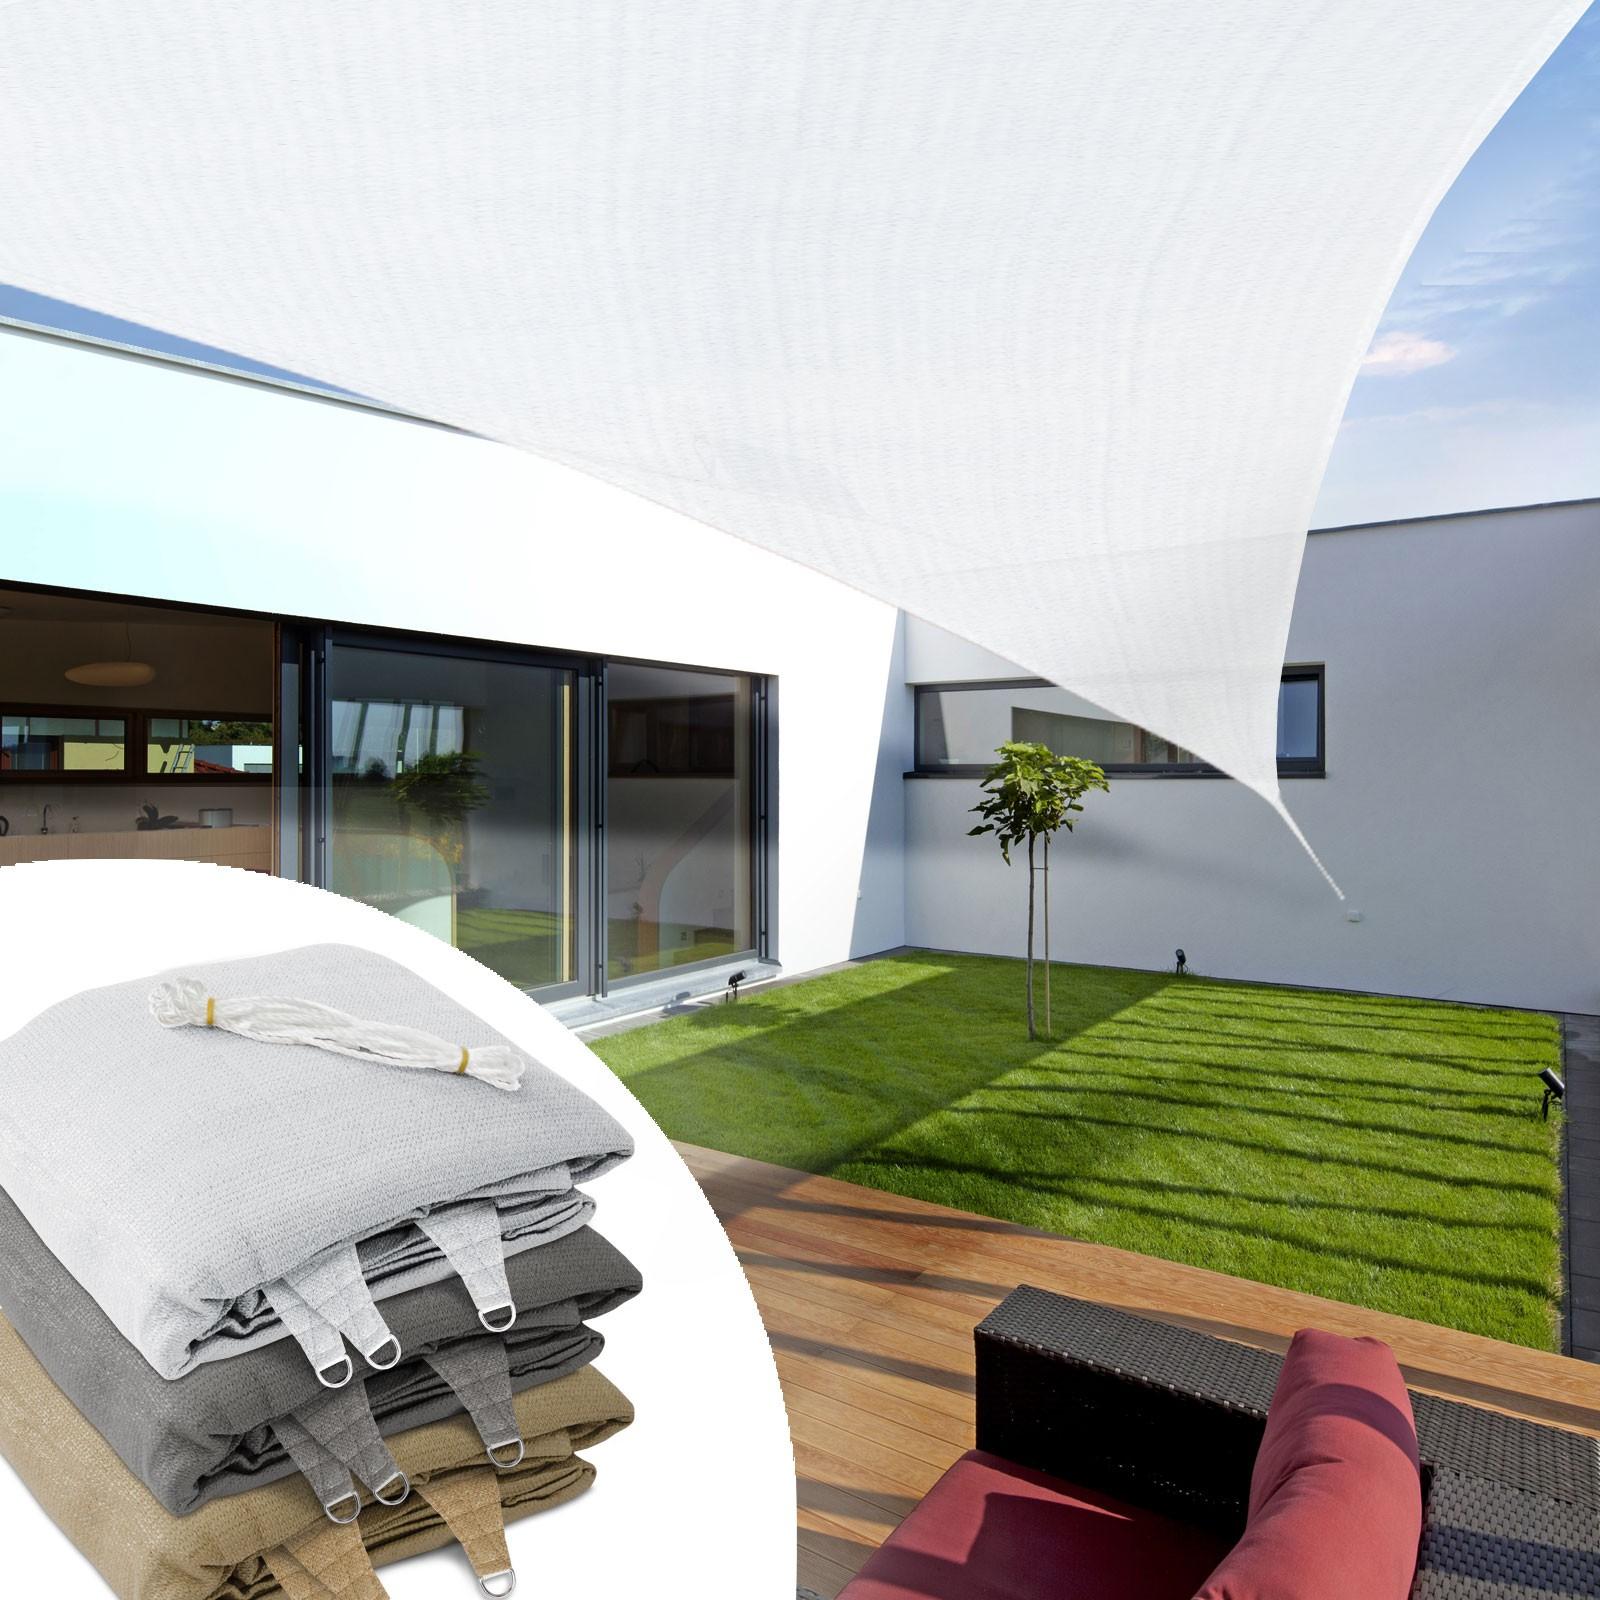 Toiles Tendues Pour Jardin, Balcon, Terrasse - Protection Anti Uv encequiconcerne Toile Tendue Jardin